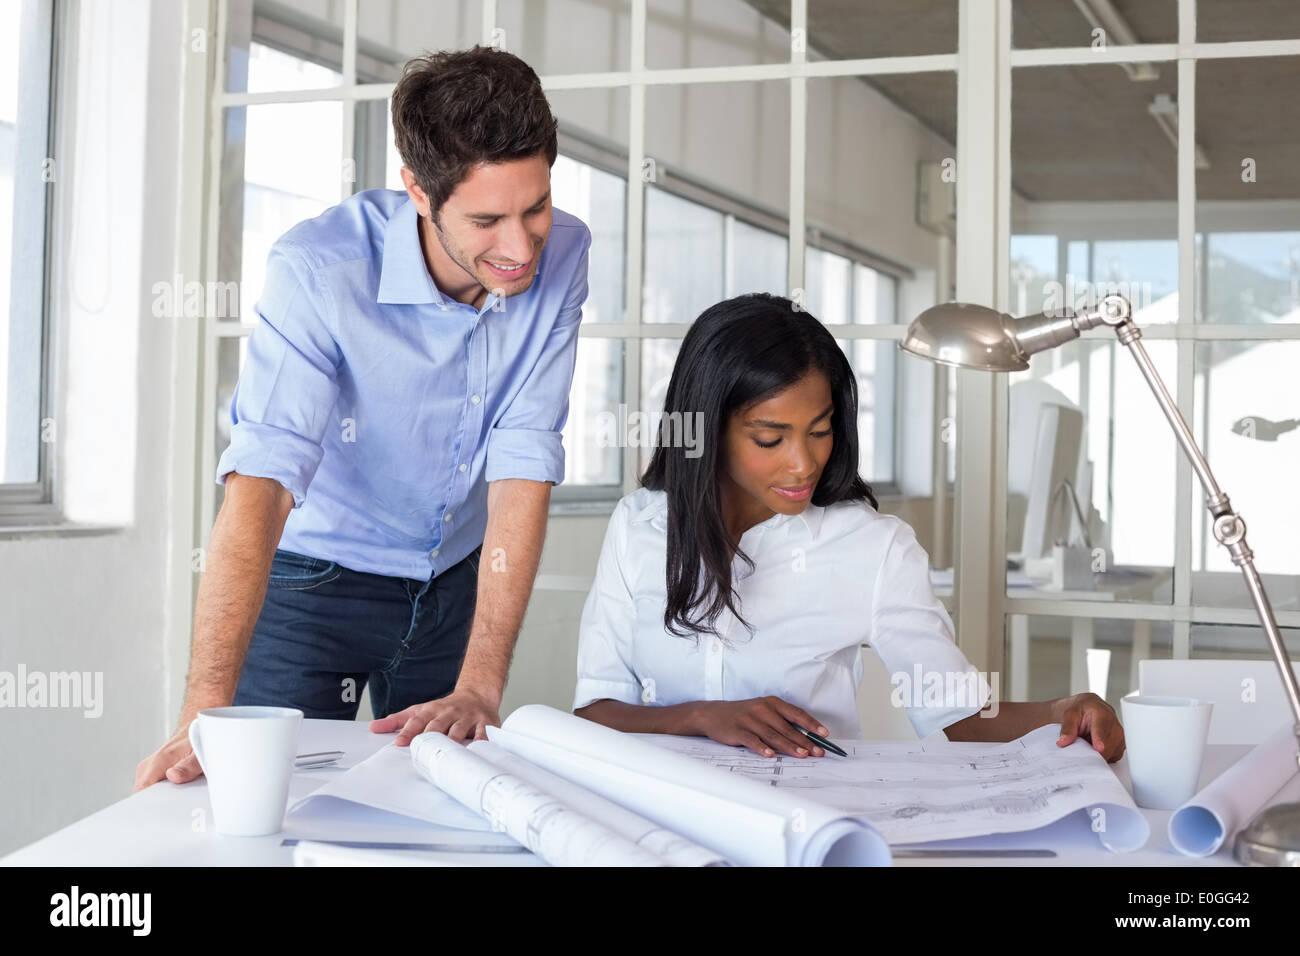 Architects working on important blueprints - Stock Image